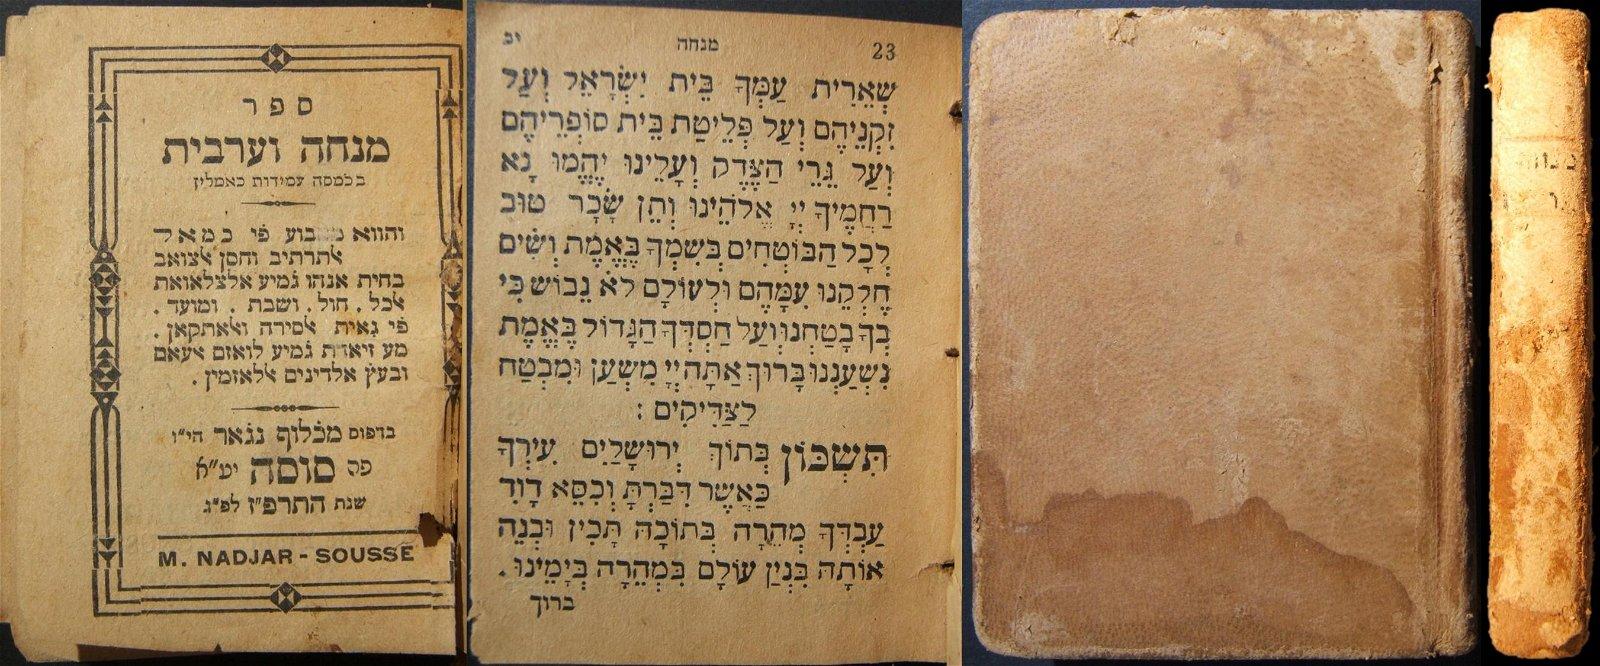 Tunisian Judaica Pocket Siddur Sefer Minha veArvit